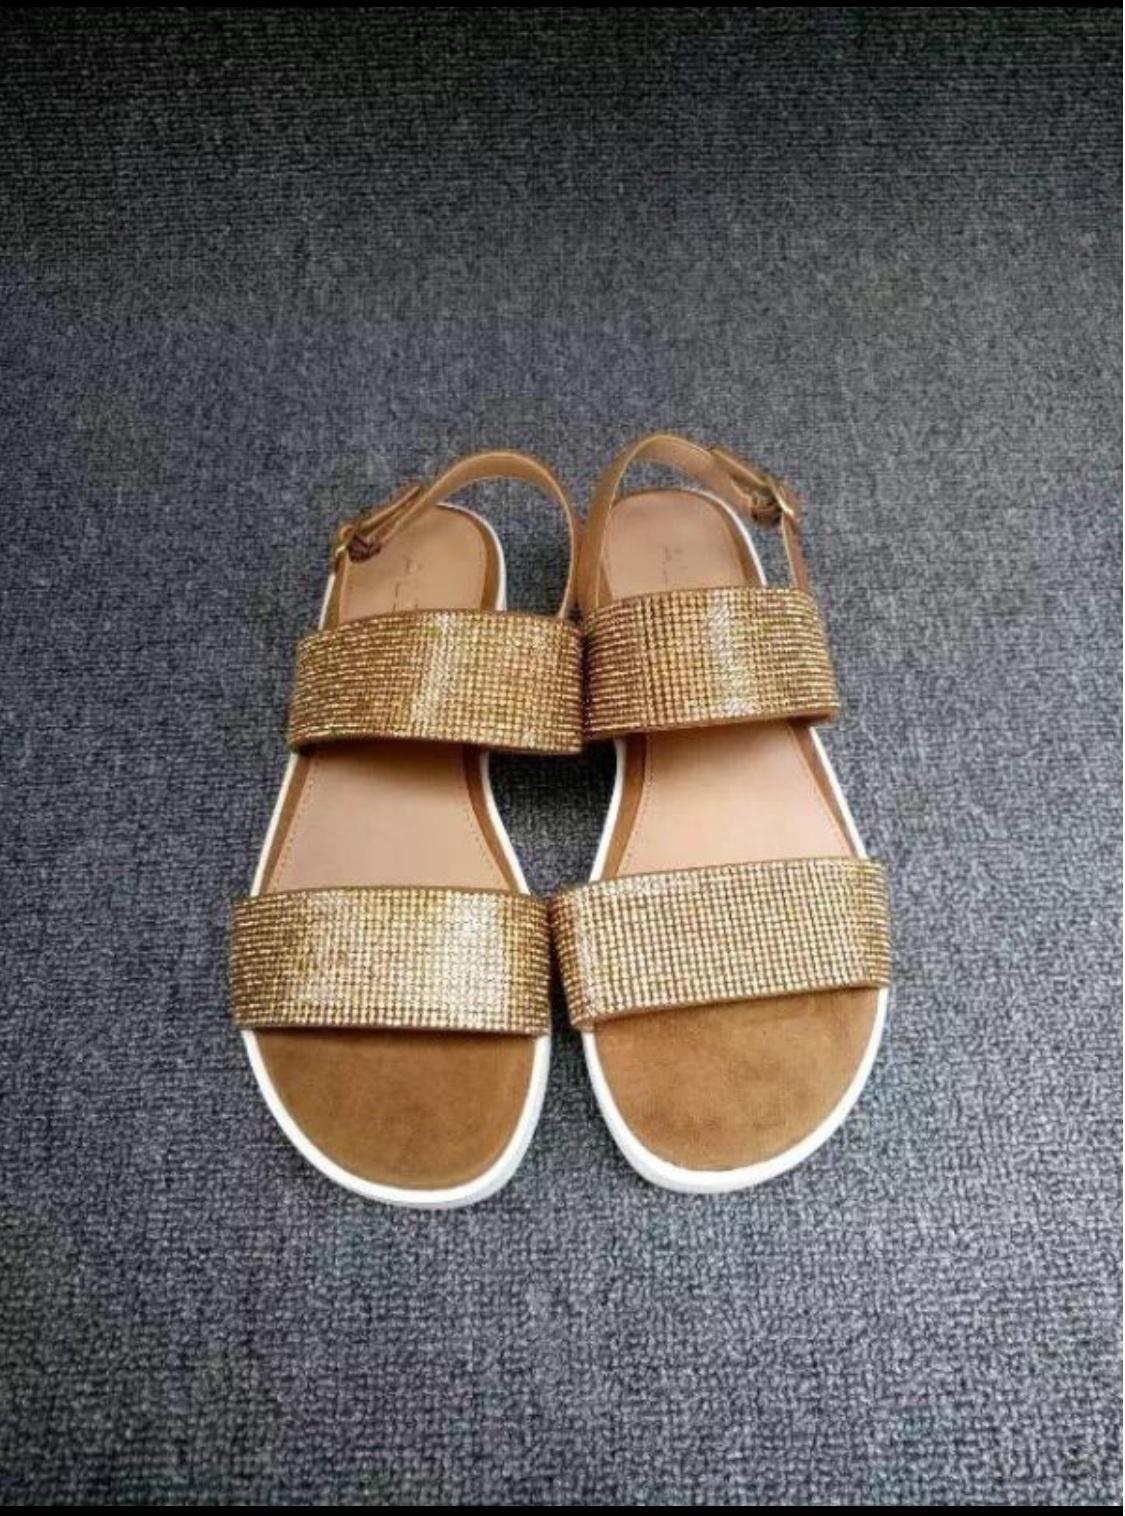 SALE - ALDO Eowenna Rhinestone covered Leather Sandals ...